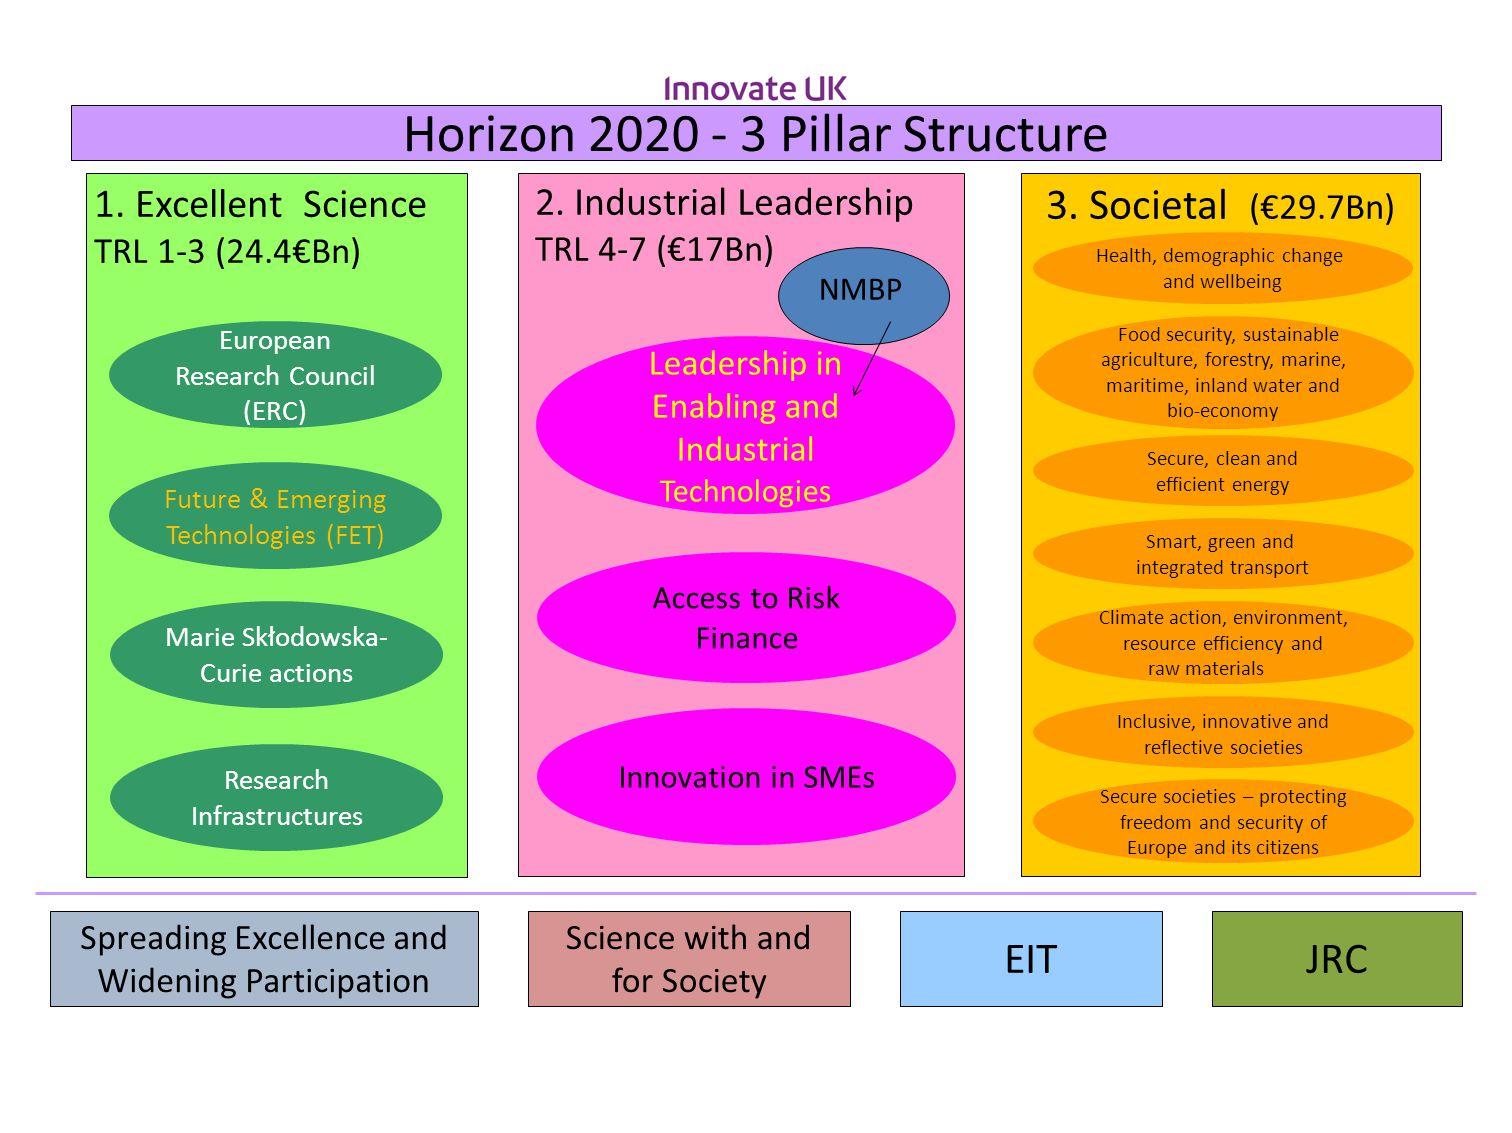 Horizon 2020 - 3 Pillar Structure